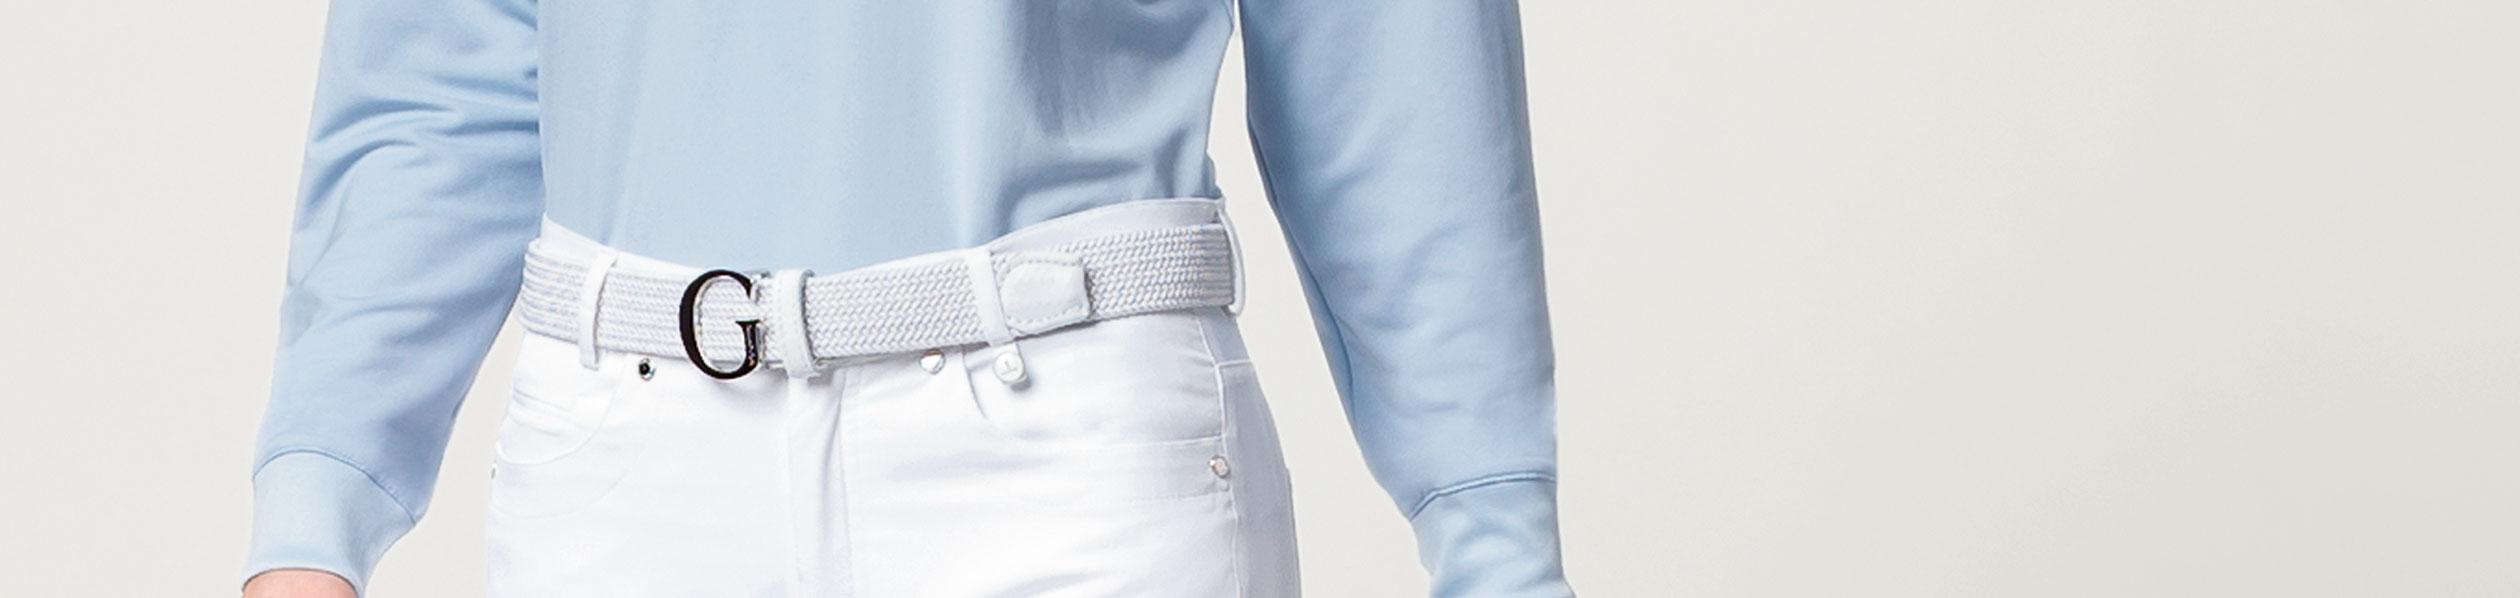 Damen-accessoires-gürtel